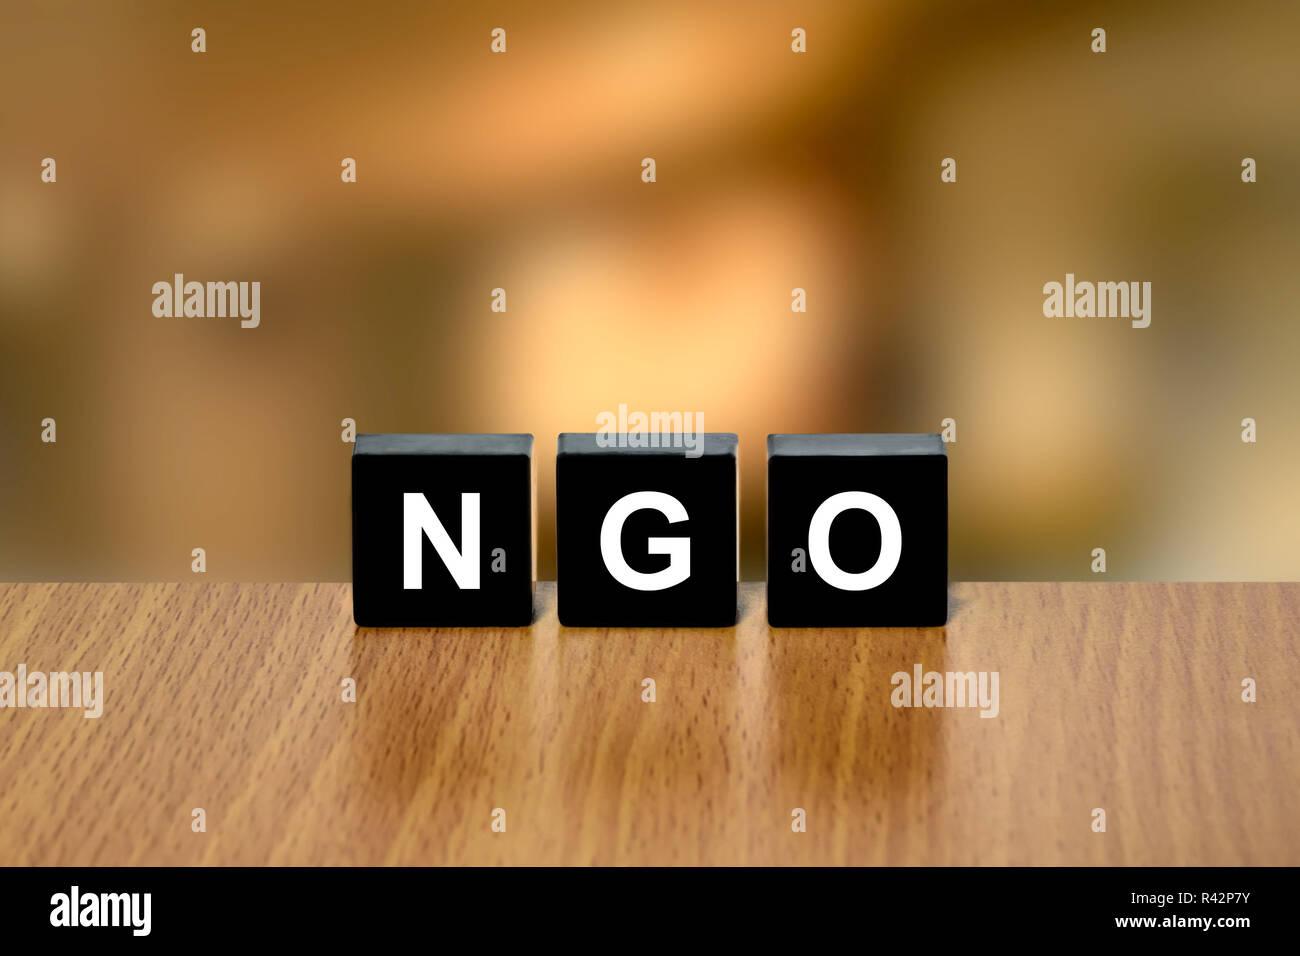 NGO or non-governmental organization on black block - Stock Image